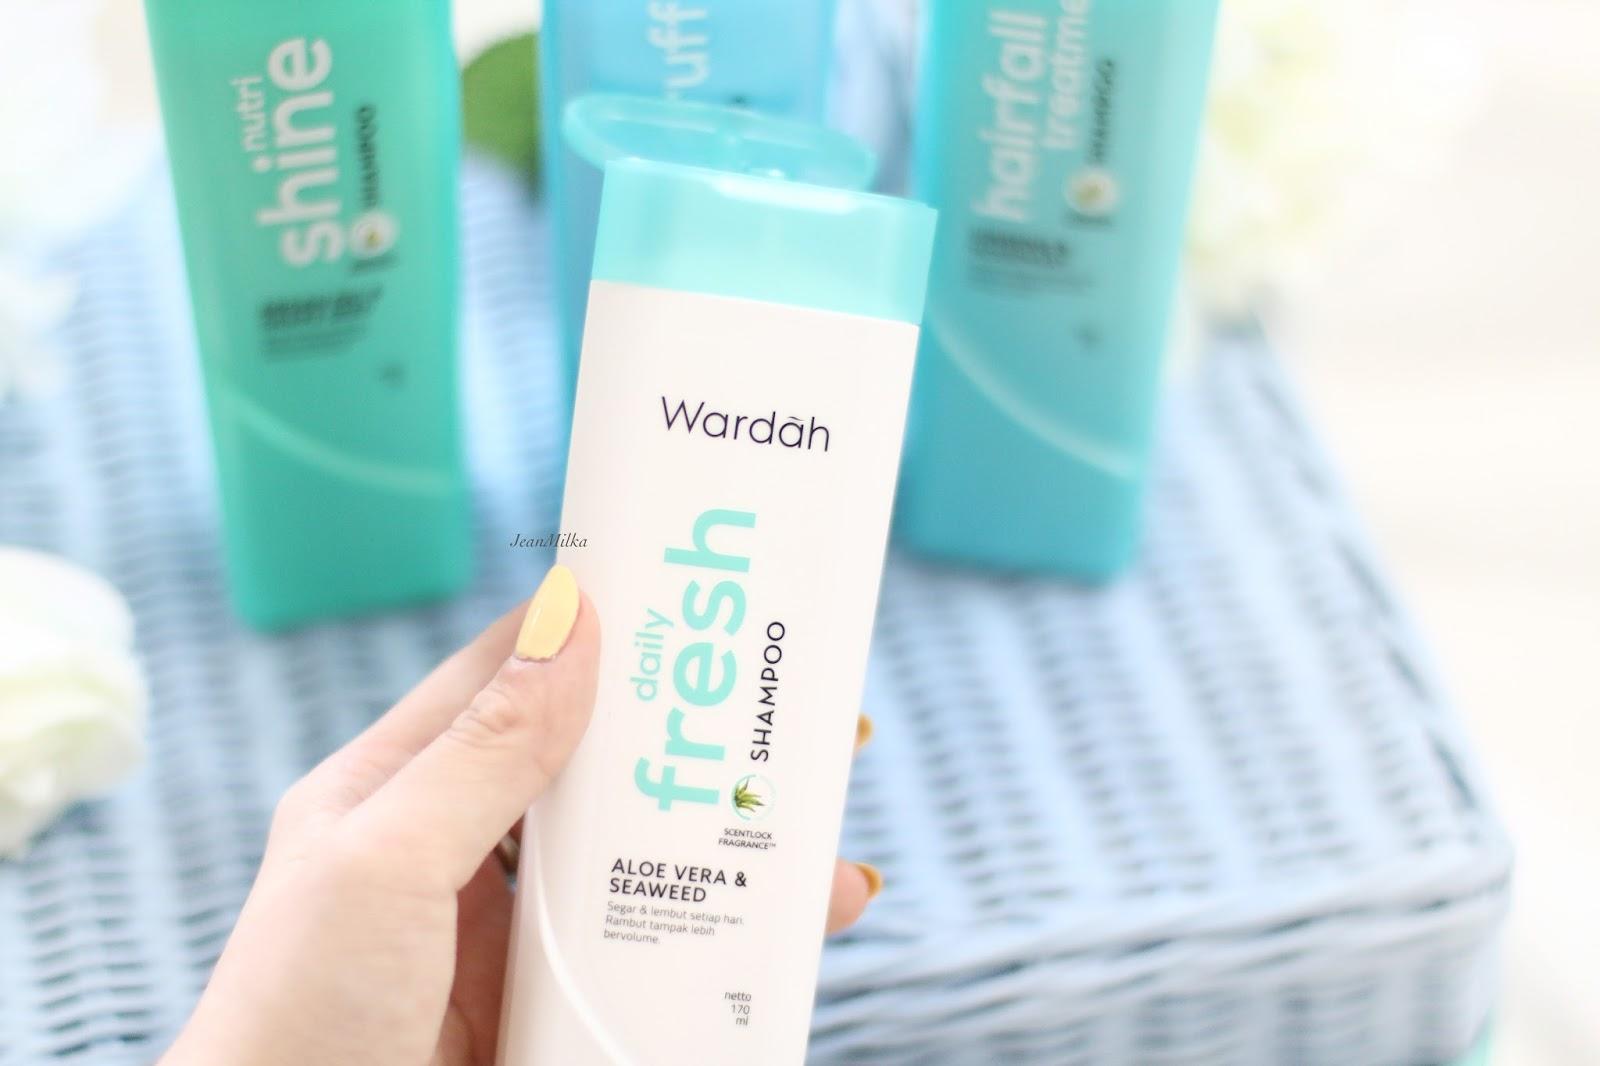 Wardah Shampoo Untuk Semua Masalah Rambut Review Jean Milka Shampo Hijab Sampo